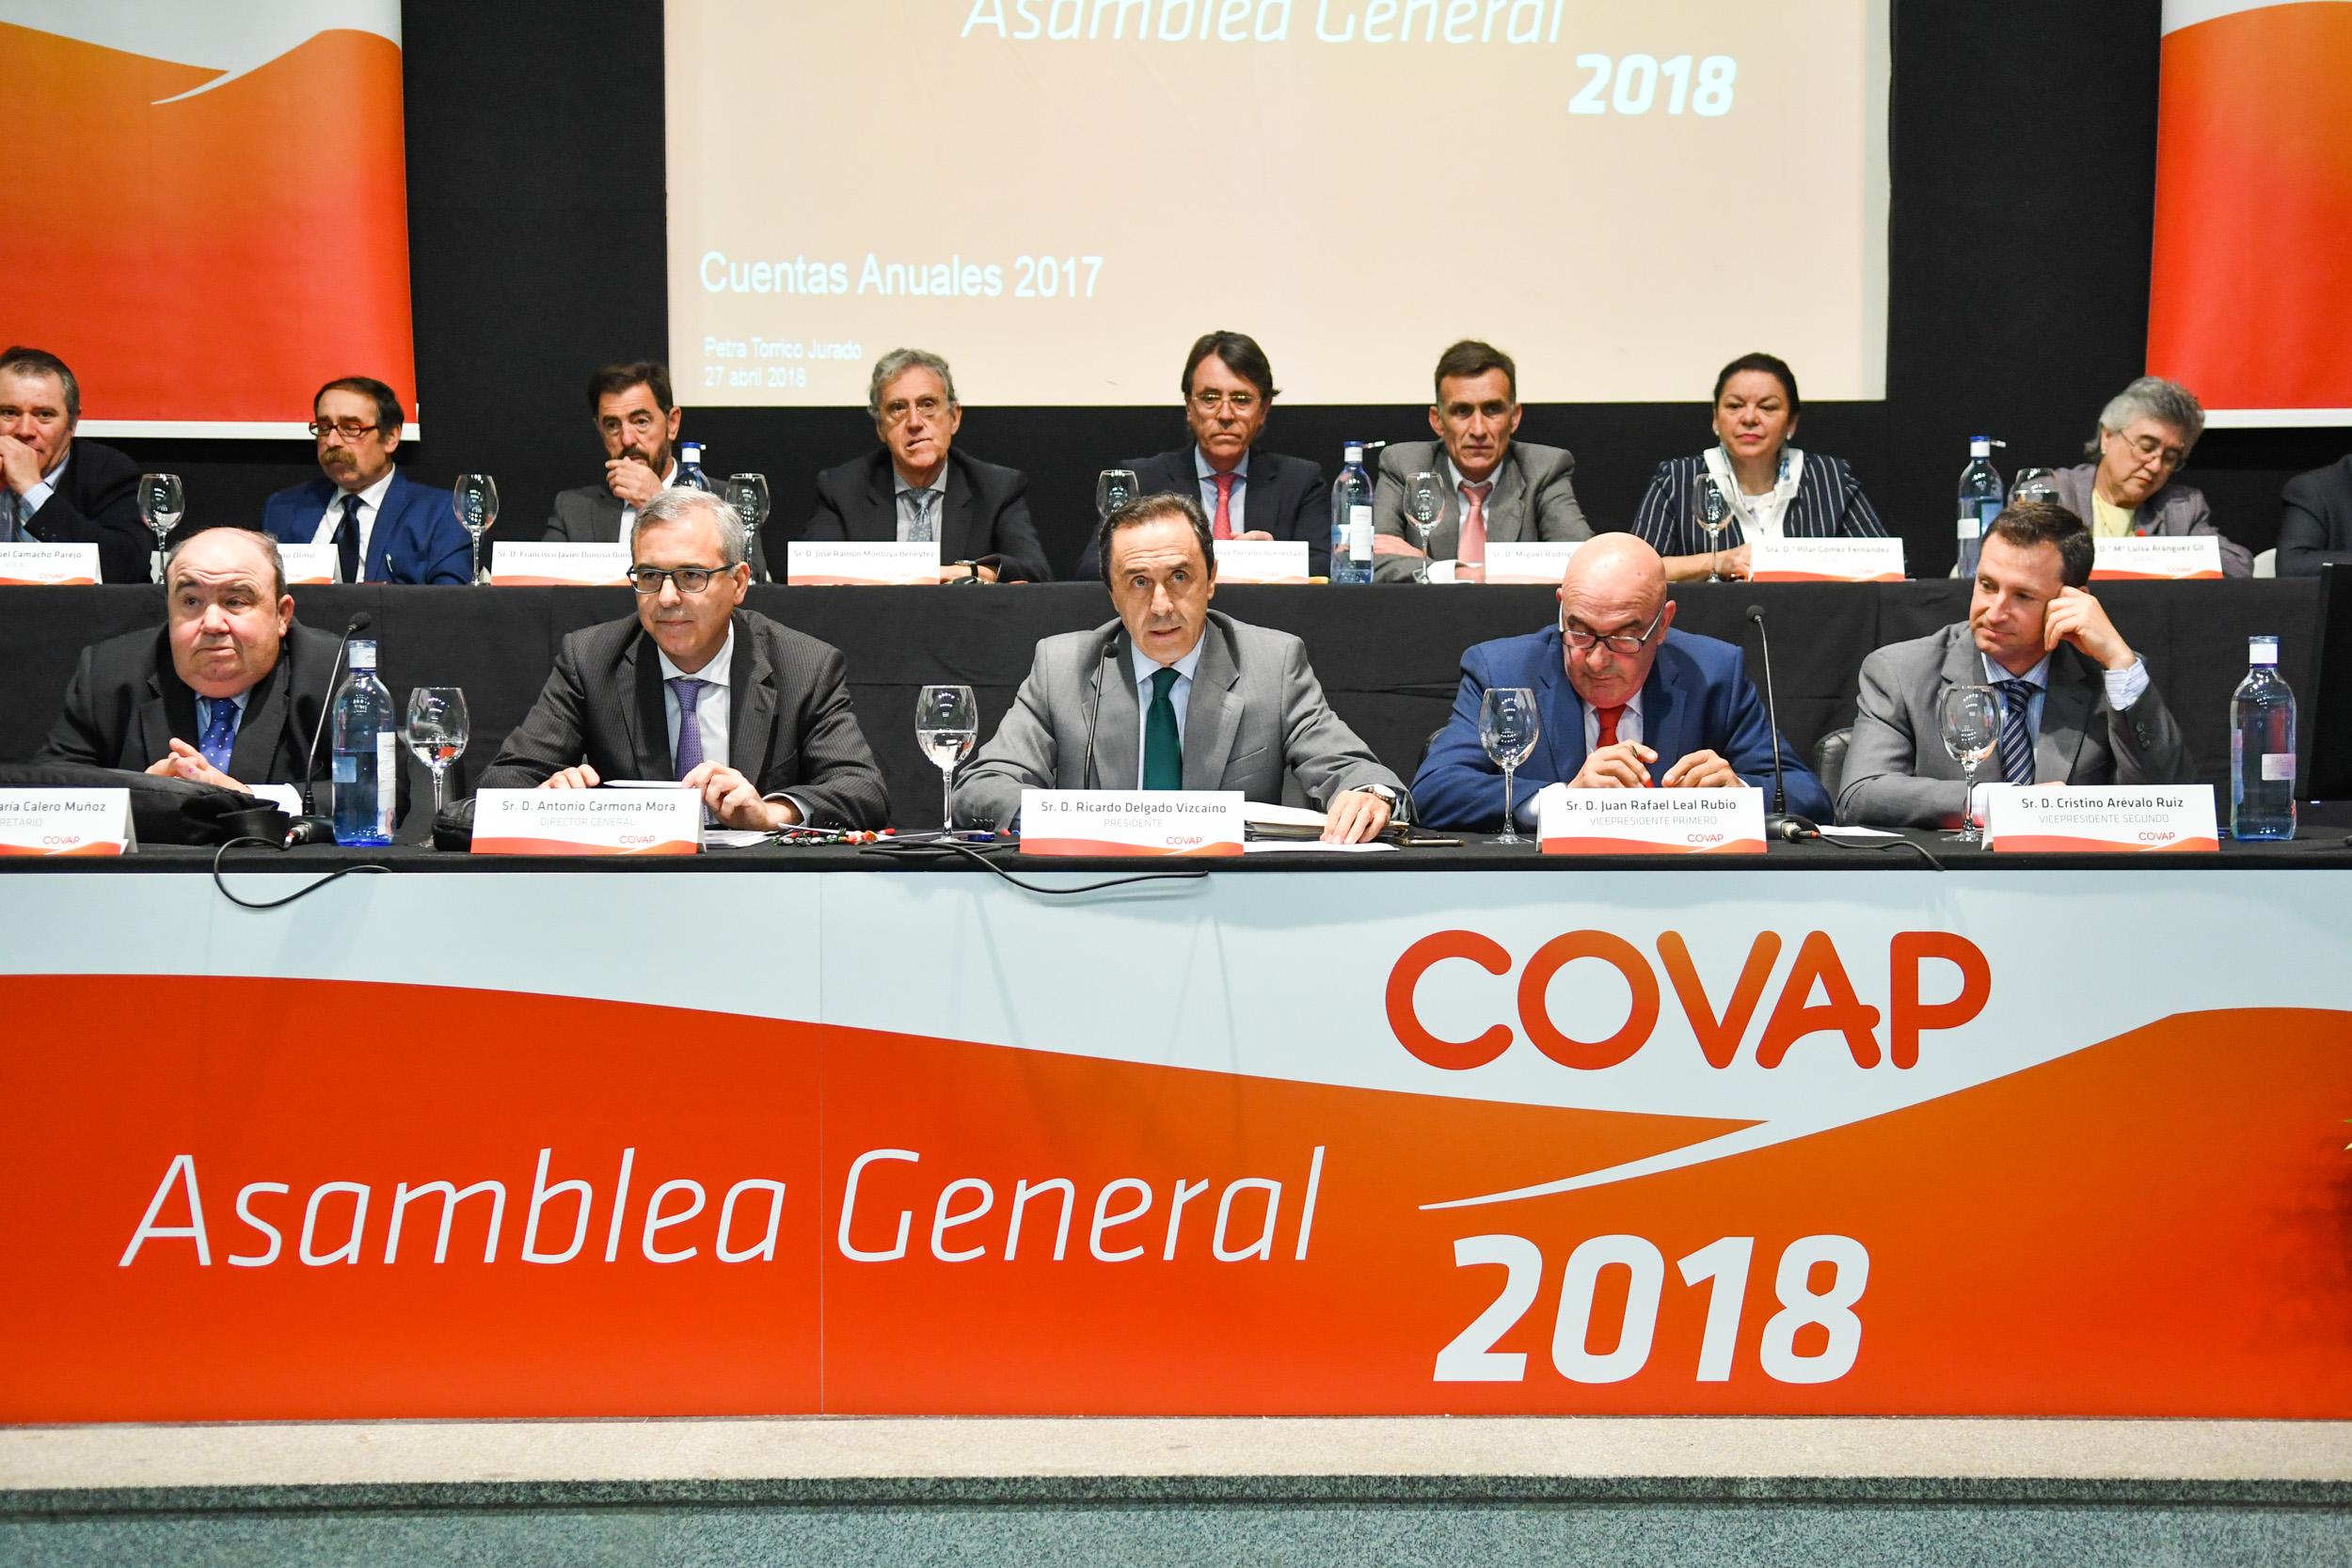 Asamblea General COVAP 2018